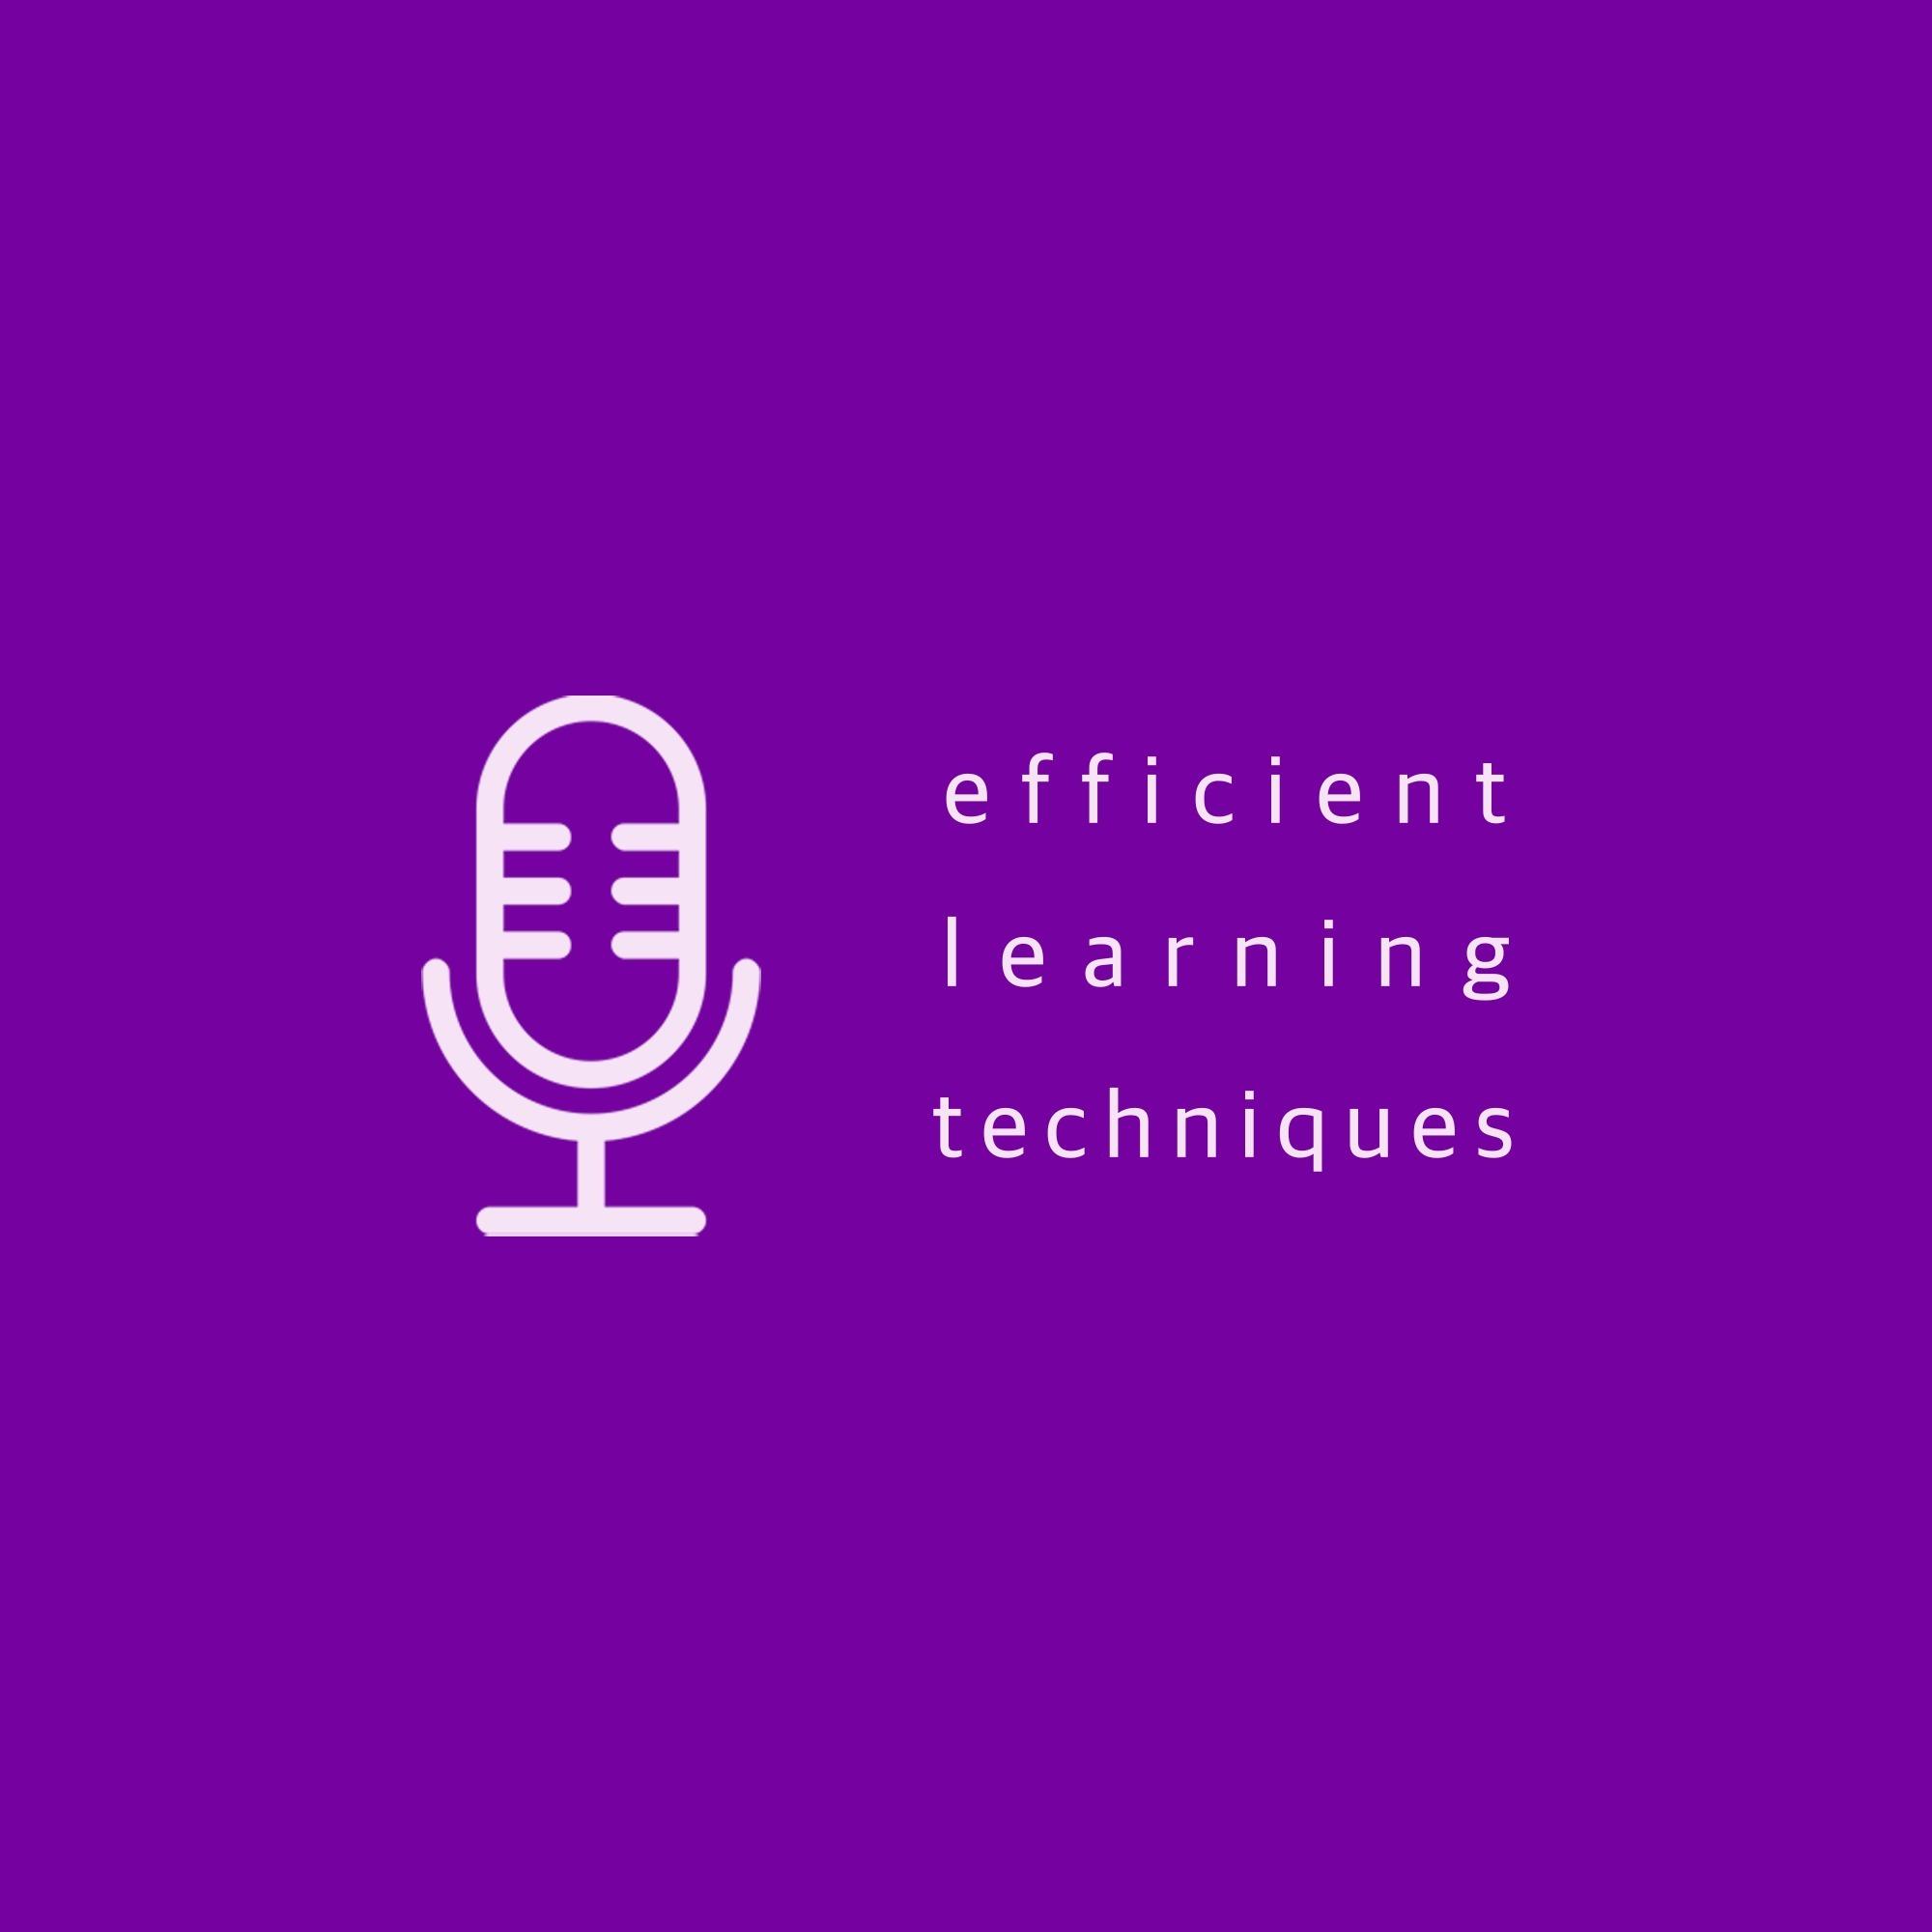 Efficient Learning Techniques